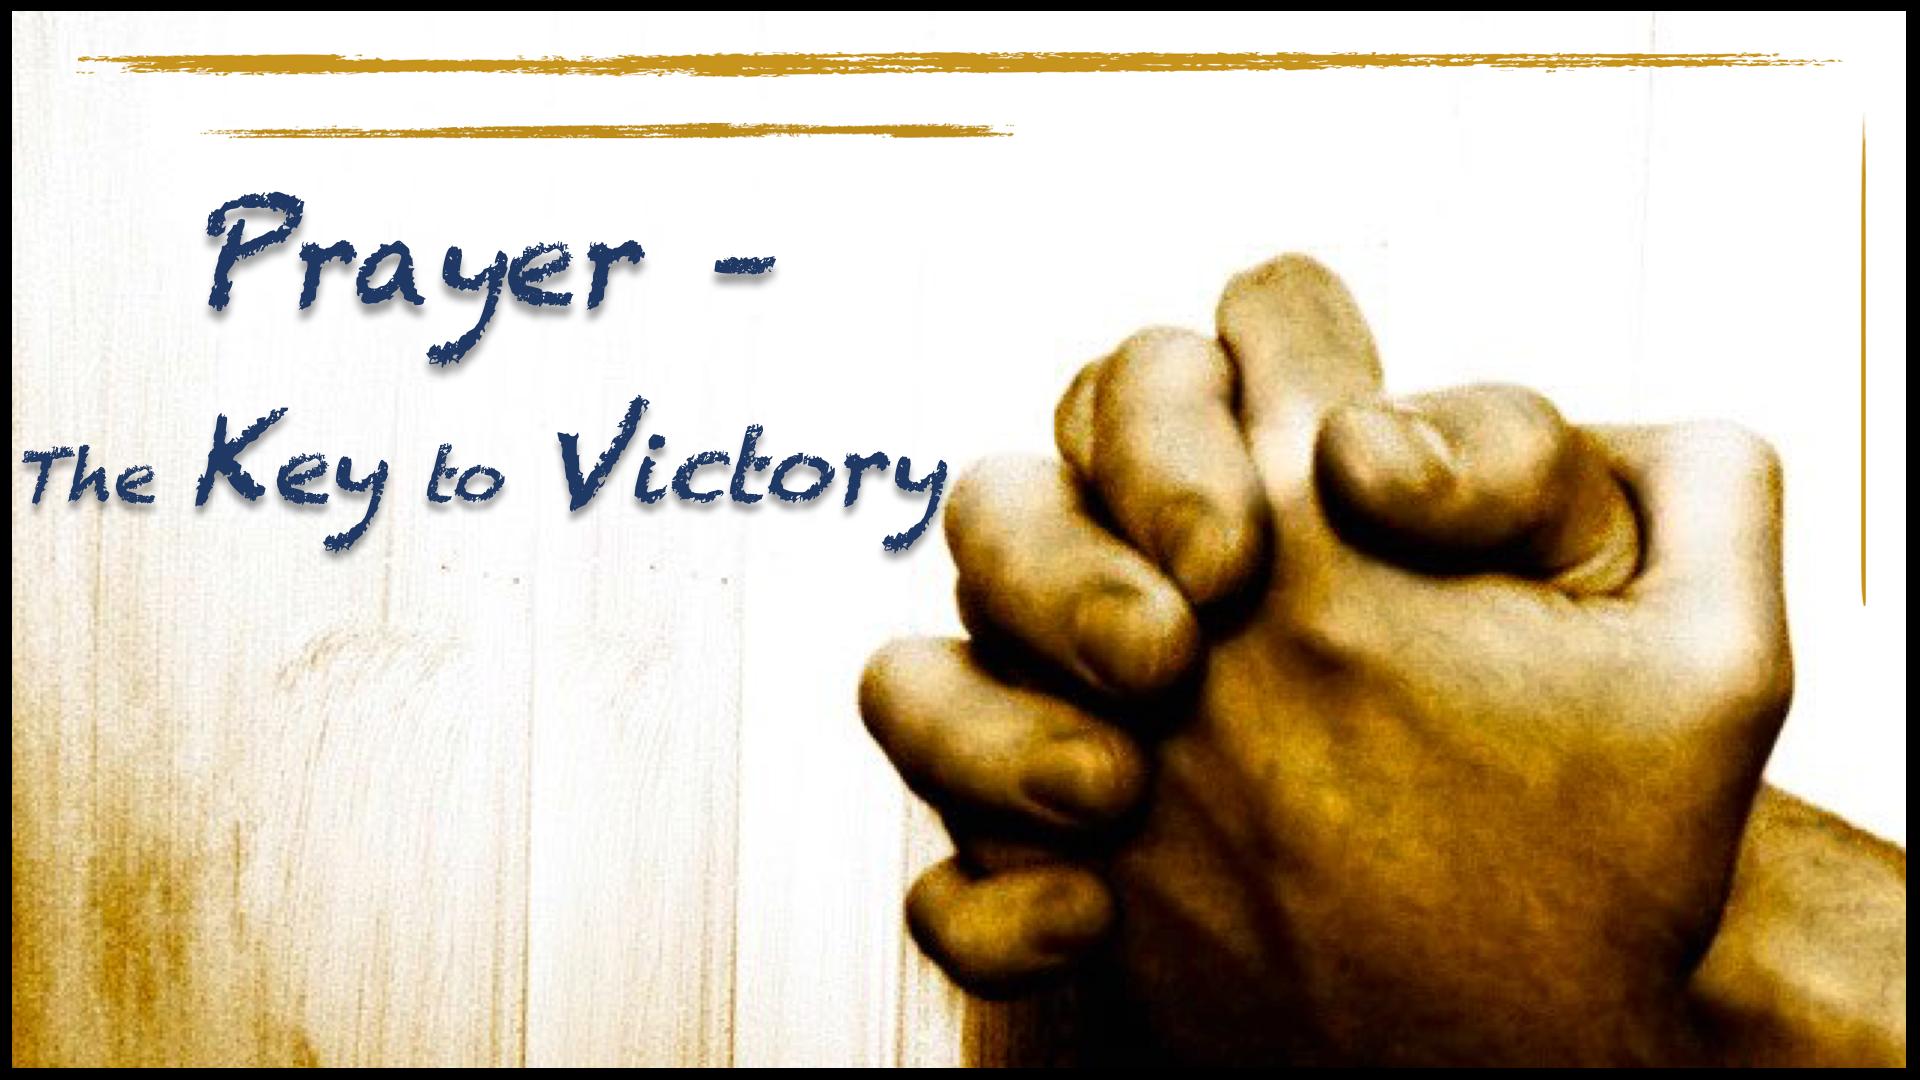 - Prayer - The Key to VictoryEphesians 4:10-20Rev. Dr. Bob VincentJune 30, 2019